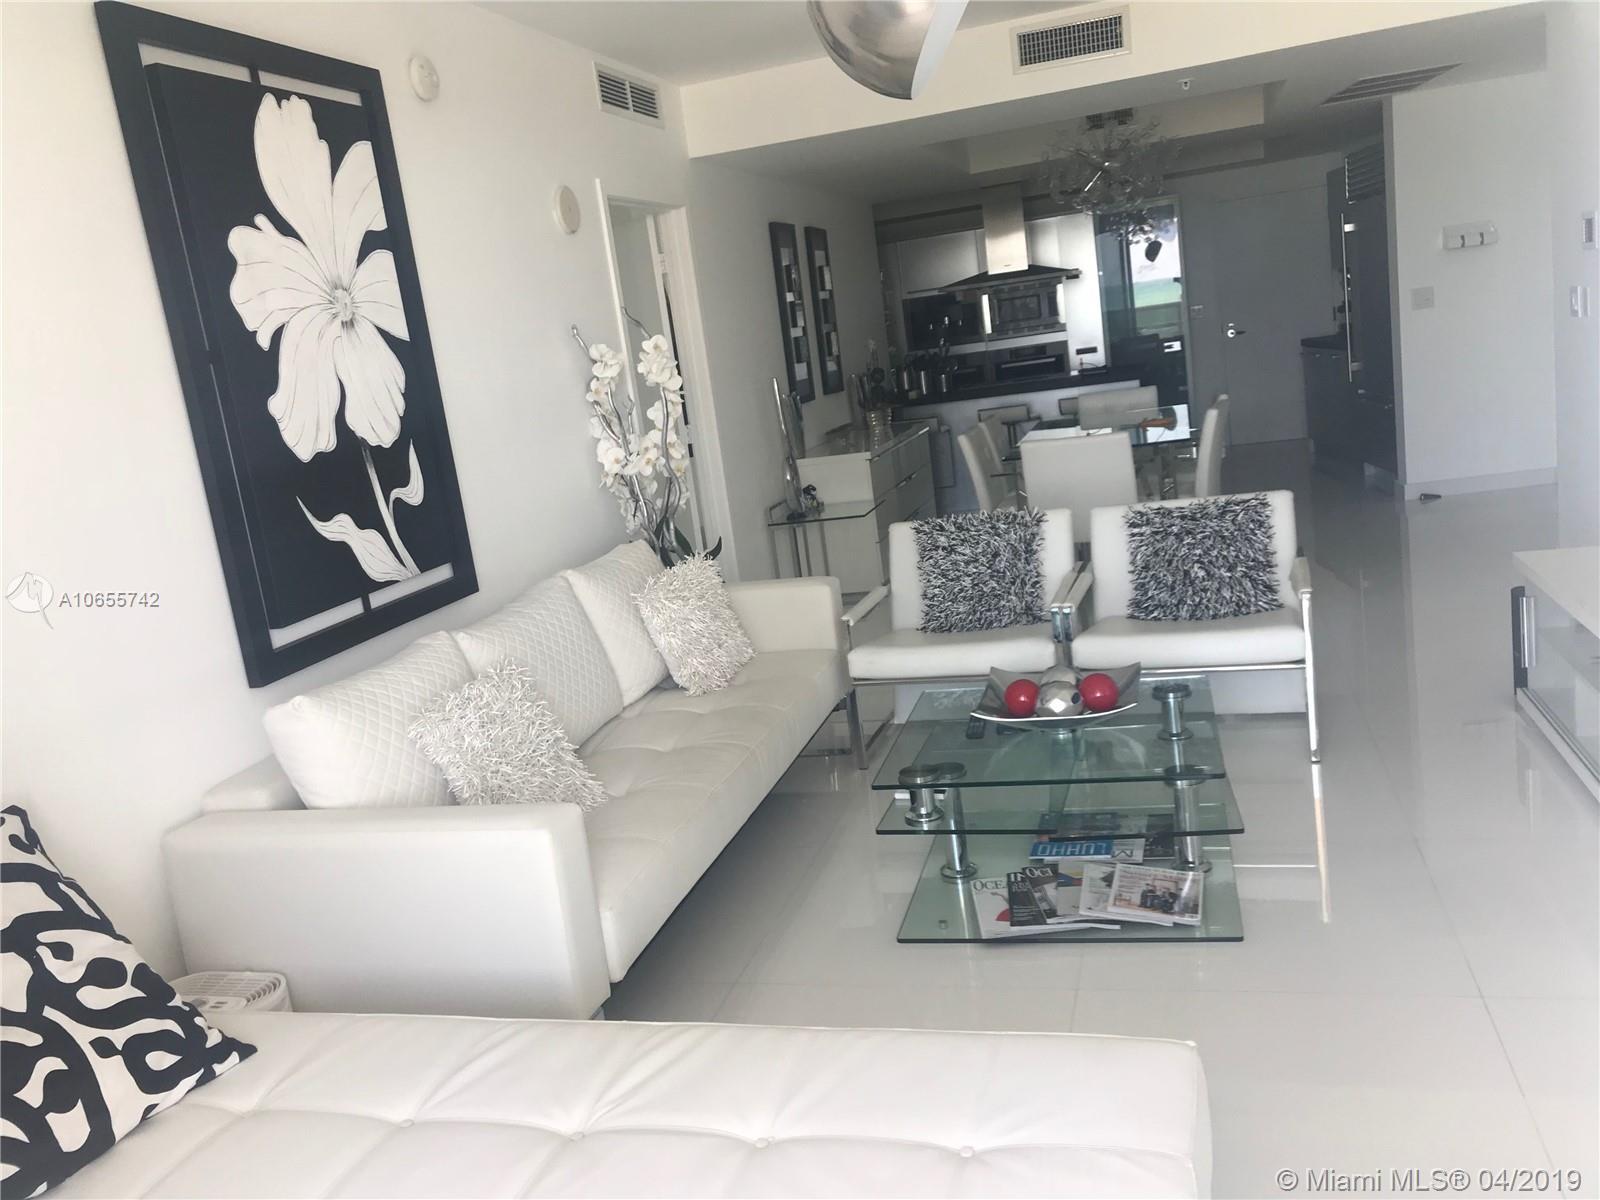 Аренда квартиры по адресу 18201 Collins Ave, Sunny Isles Beach, FL 33160 в США